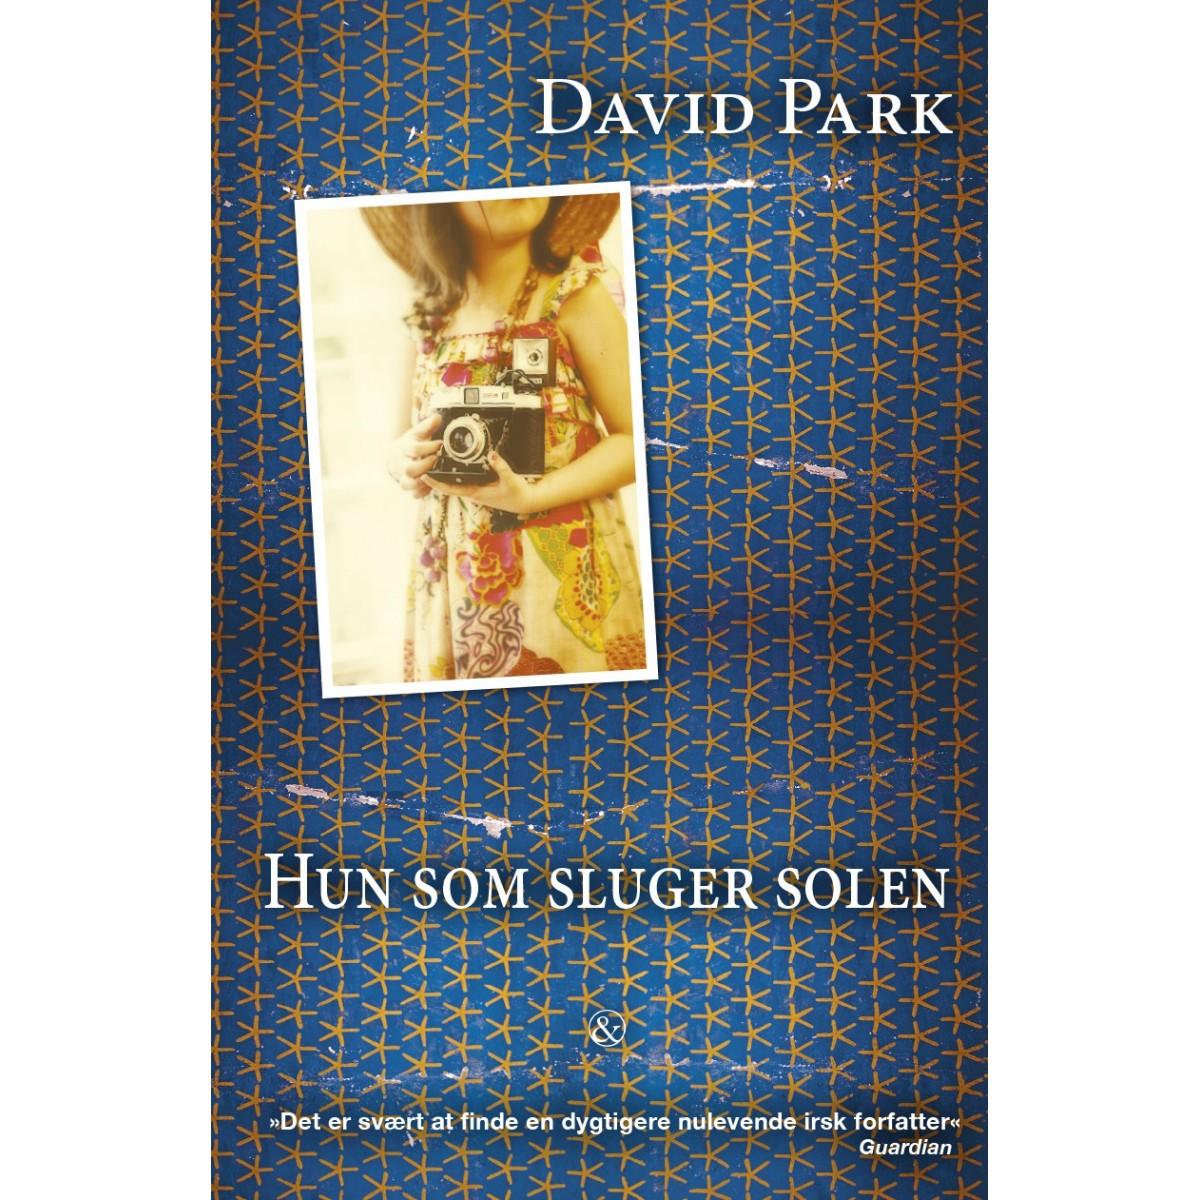 David Park: Hun som sluger solen